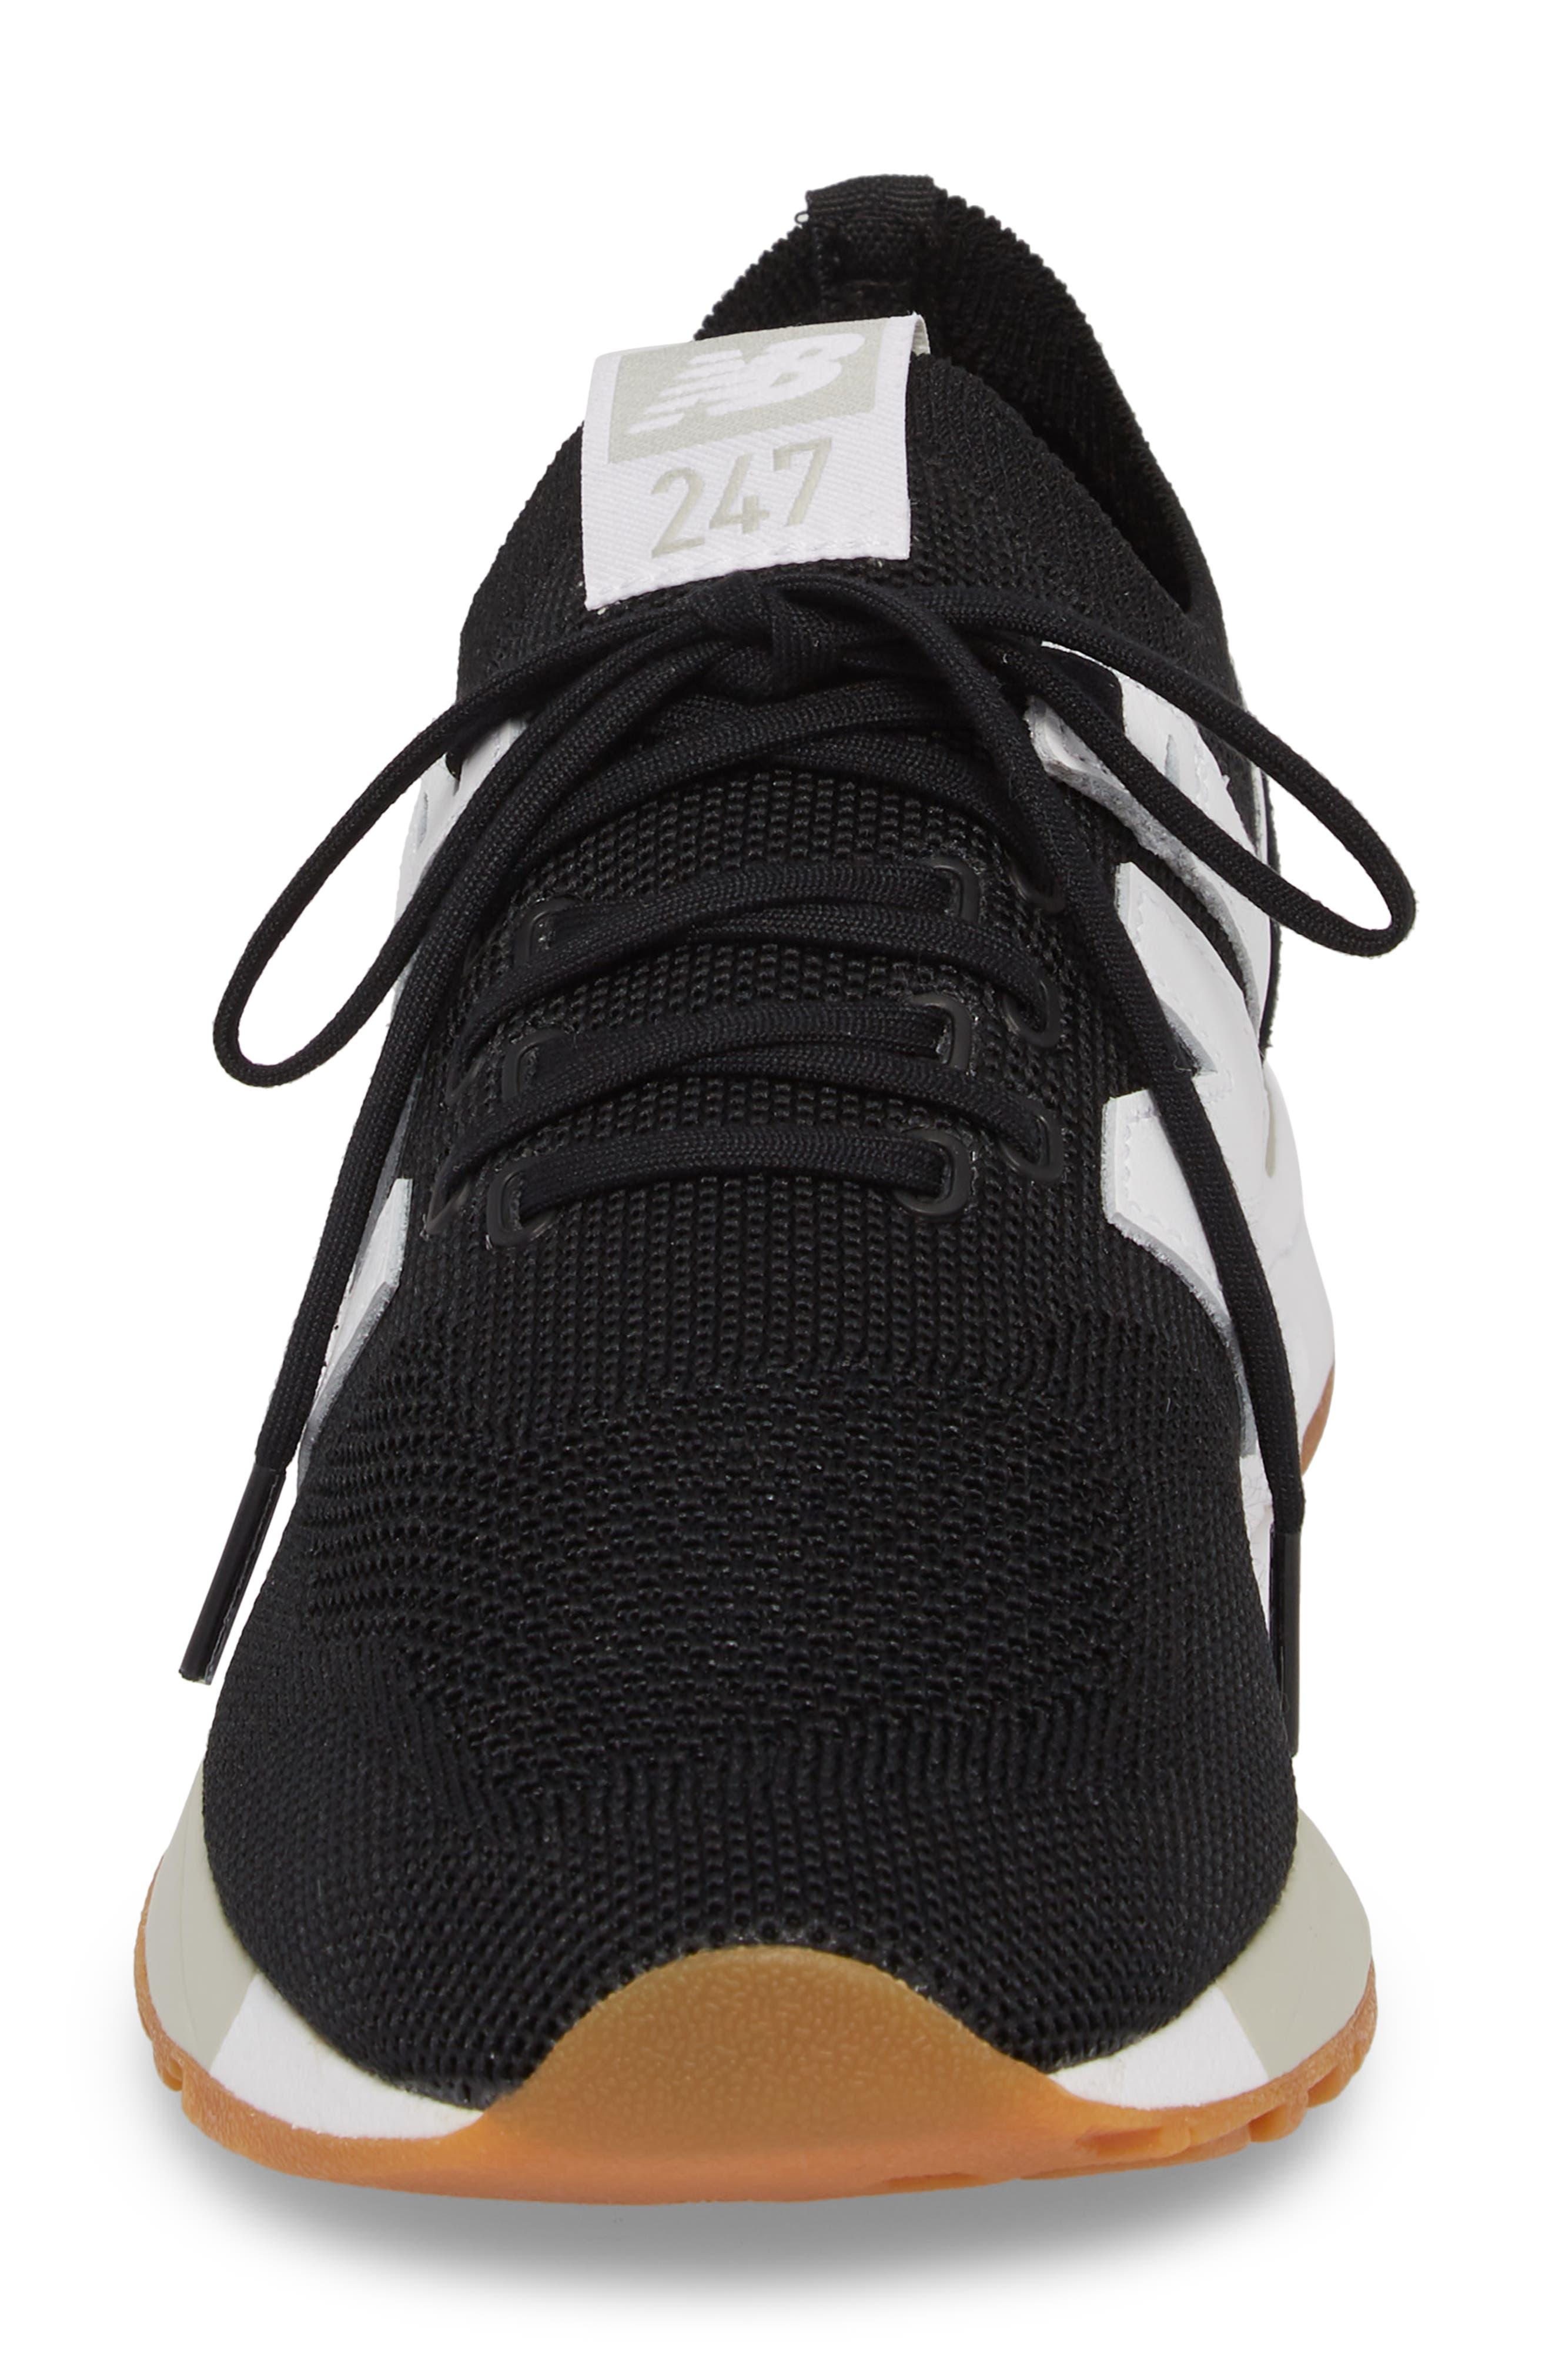 247 Decon Sneaker,                             Alternate thumbnail 4, color,                             001